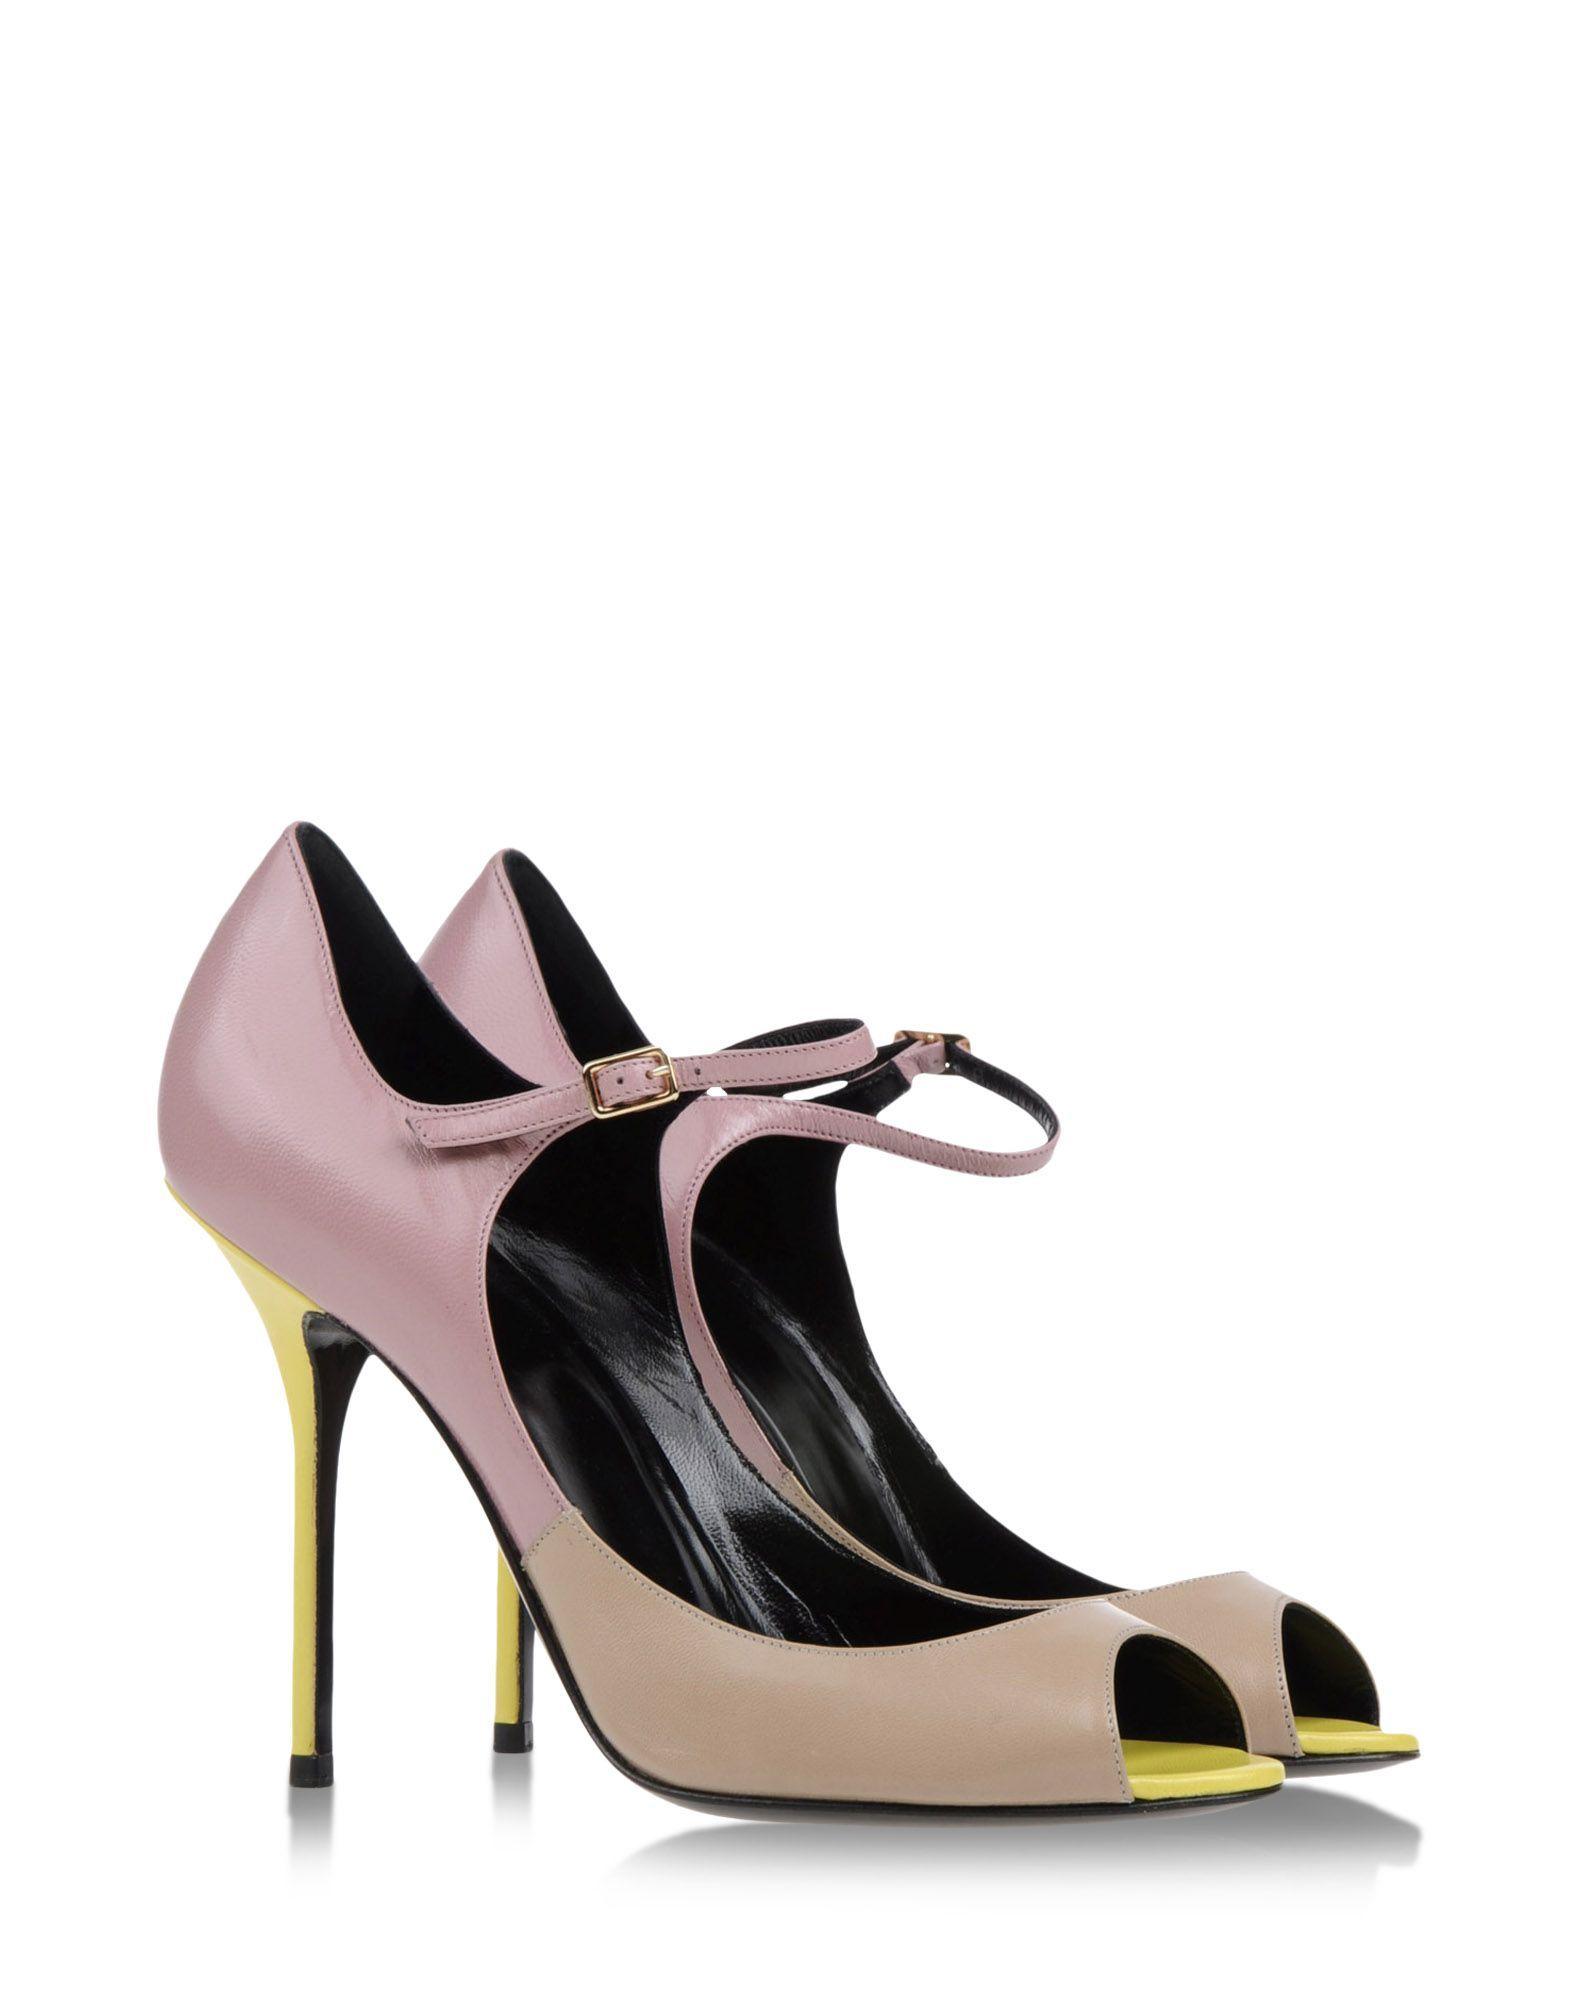 Shop online Women's Pierre Hardy at shoescribe.com